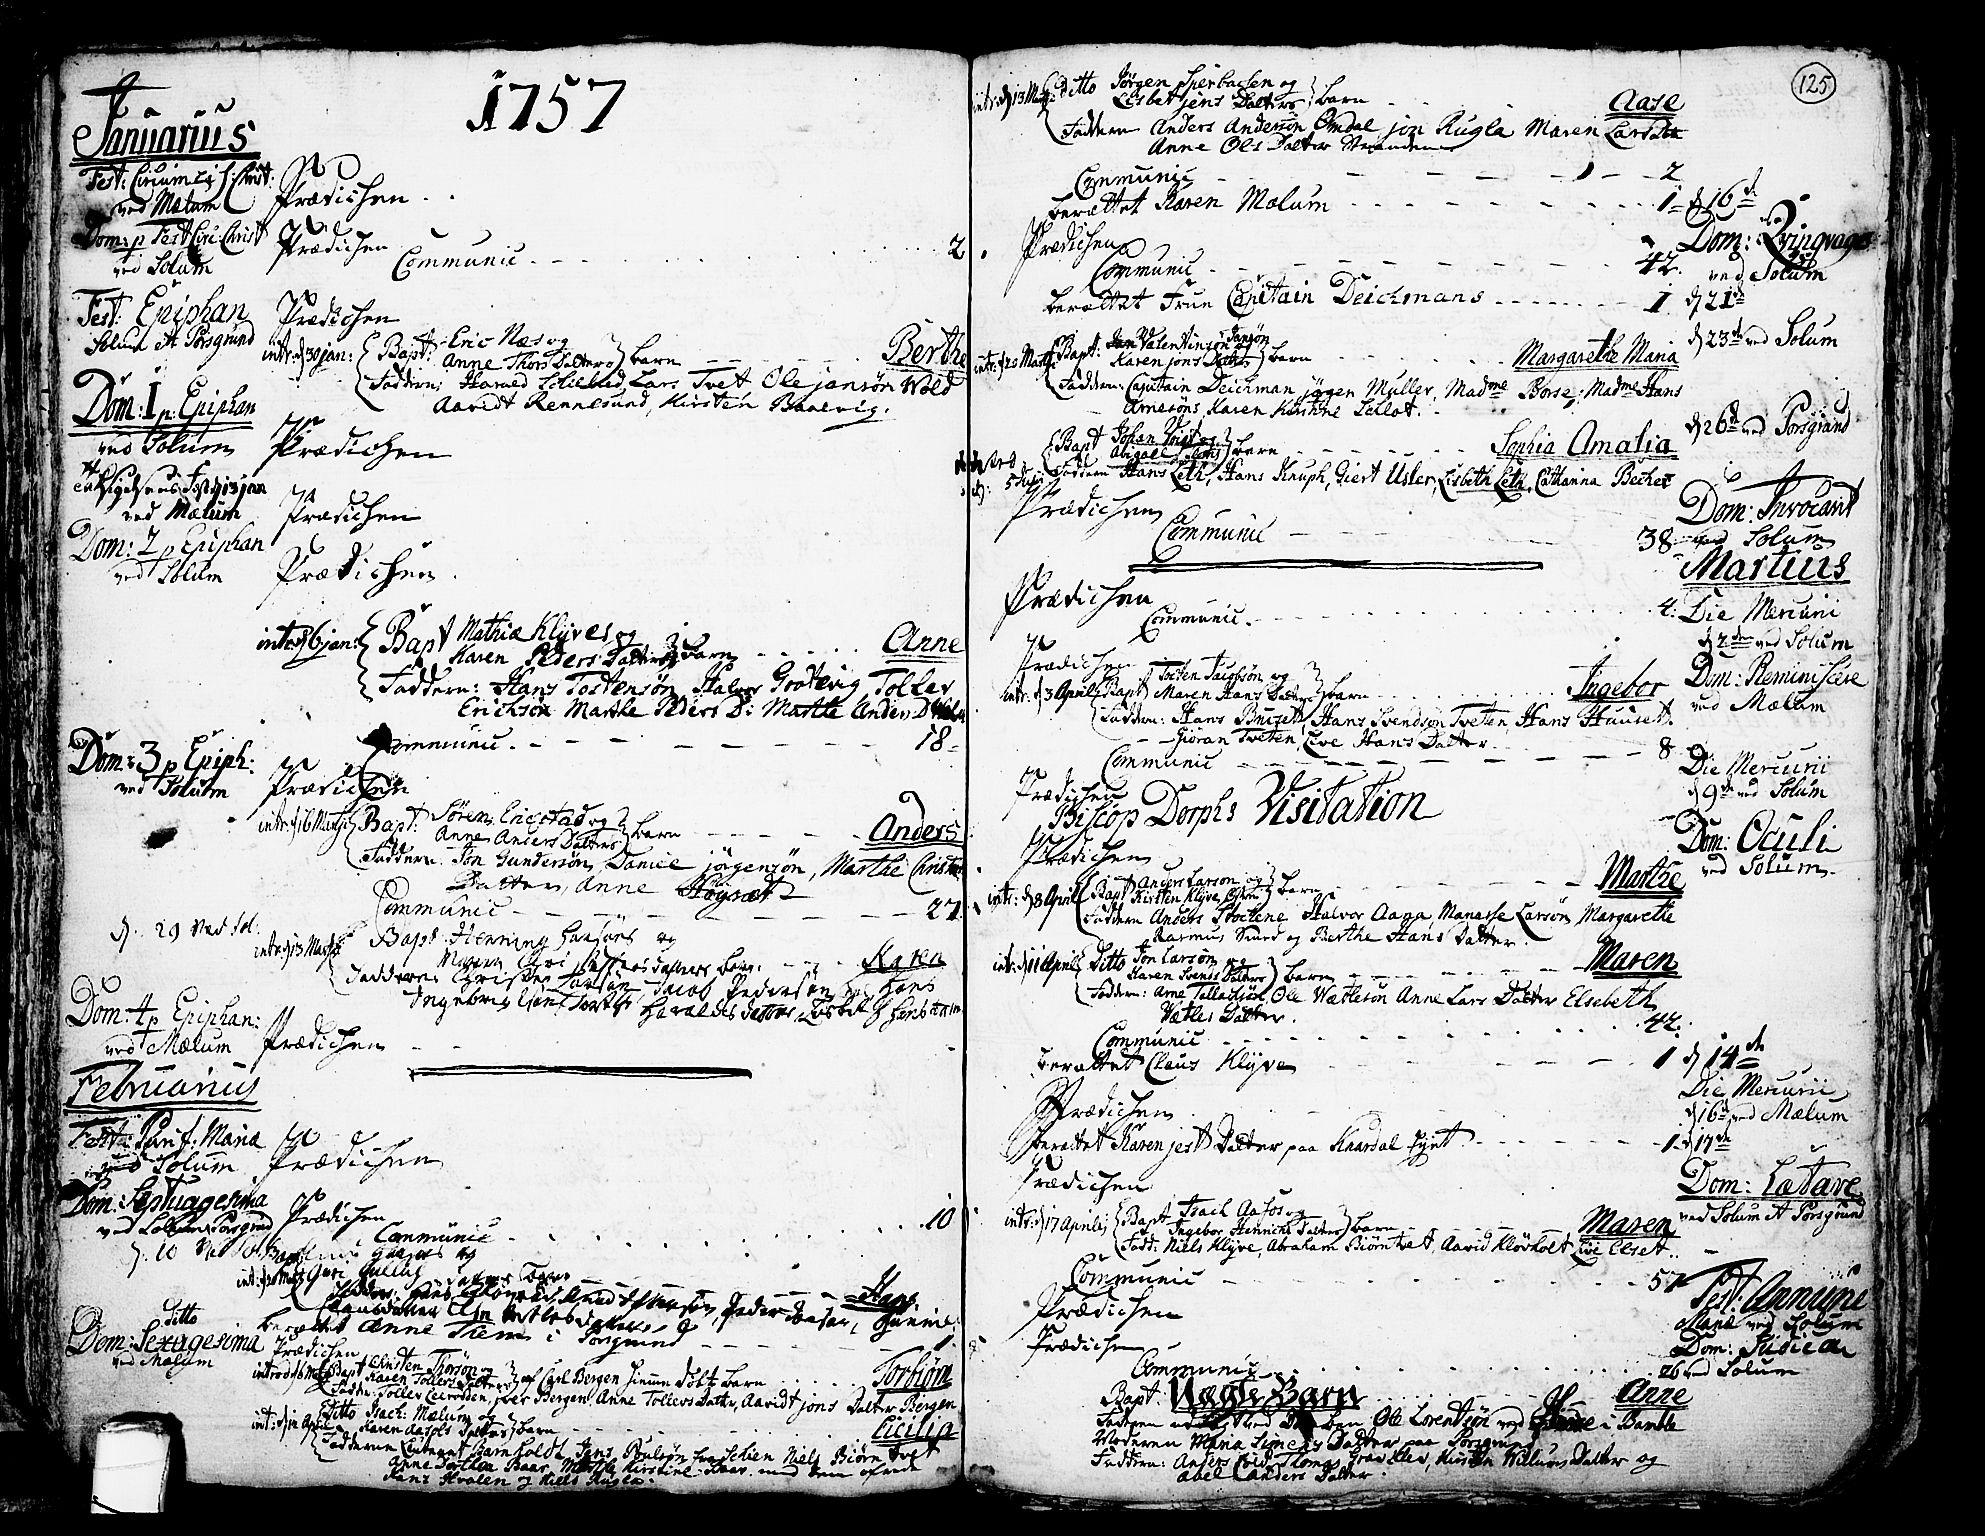 SAKO, Solum kirkebøker, F/Fa/L0002: Ministerialbok nr. I 2, 1713-1761, s. 125